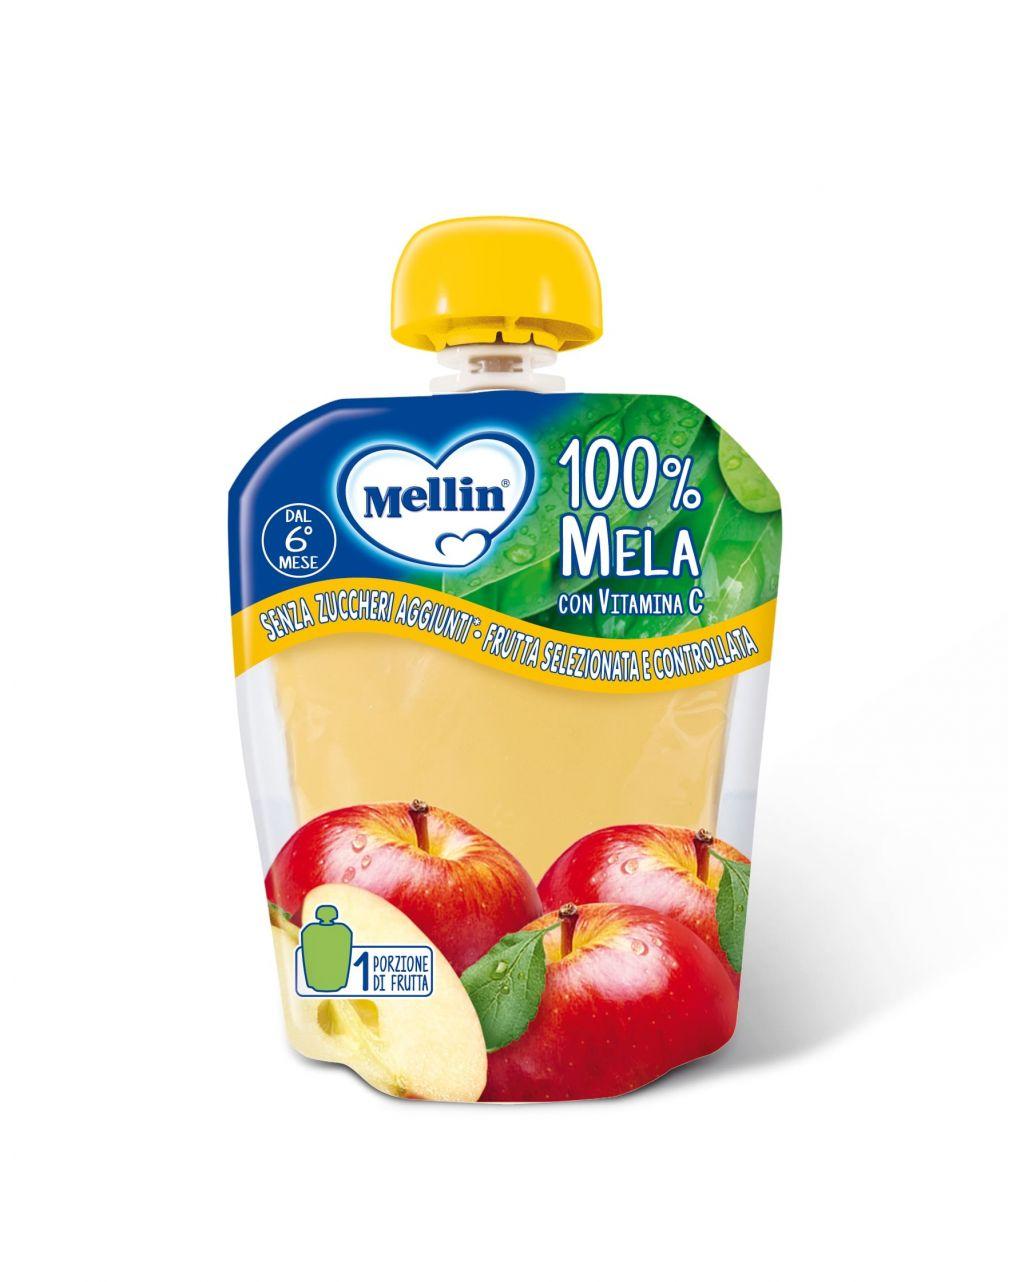 Mellin - pouch mela 90g - Mellin